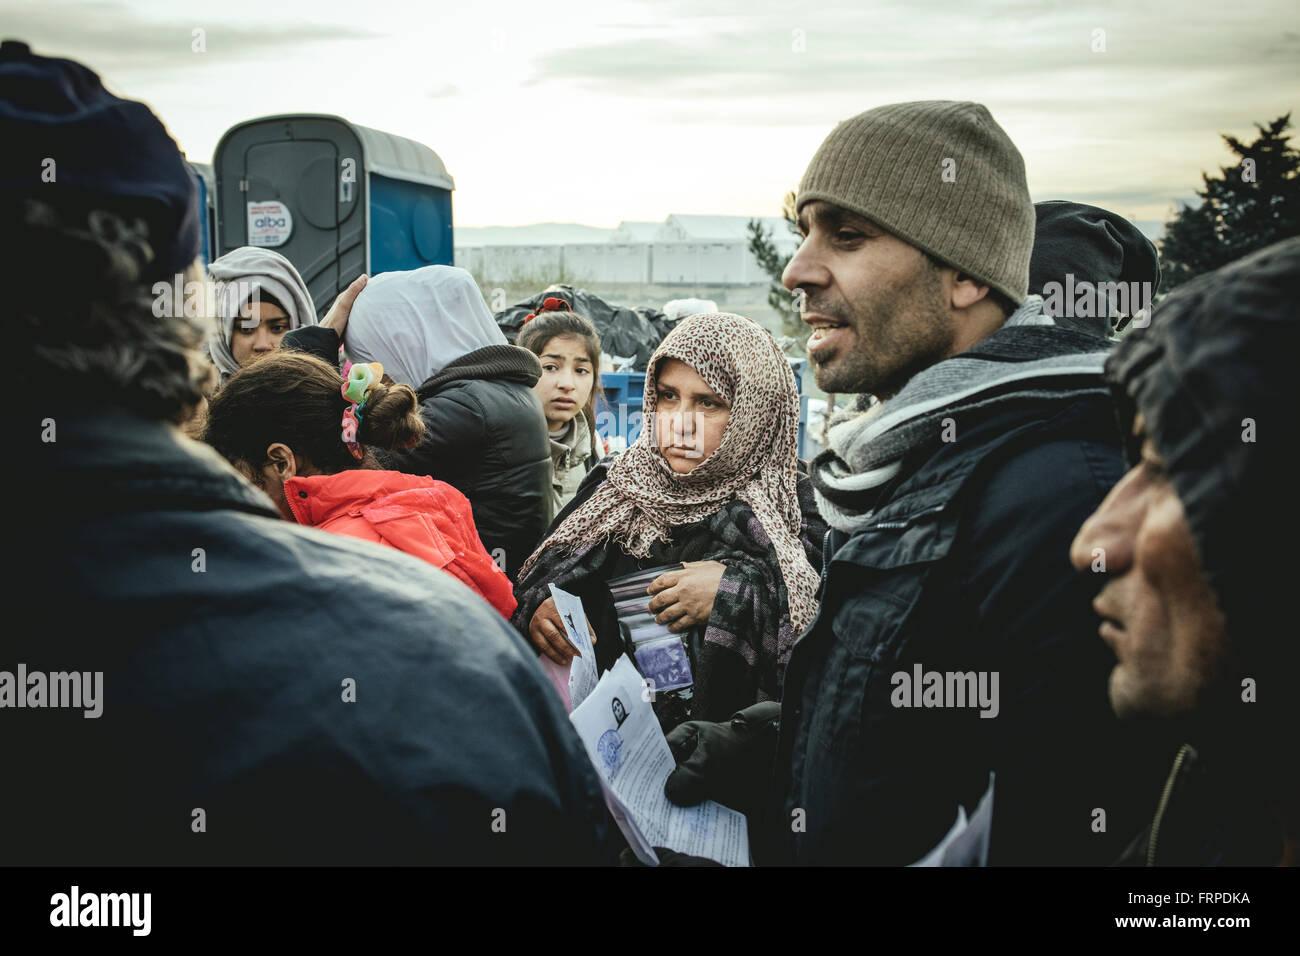 Idomeni refugee camp on the Greece Macedonia border, refugees waiting at a checkpoint, Idomeni, Central Macedonia, - Stock Image